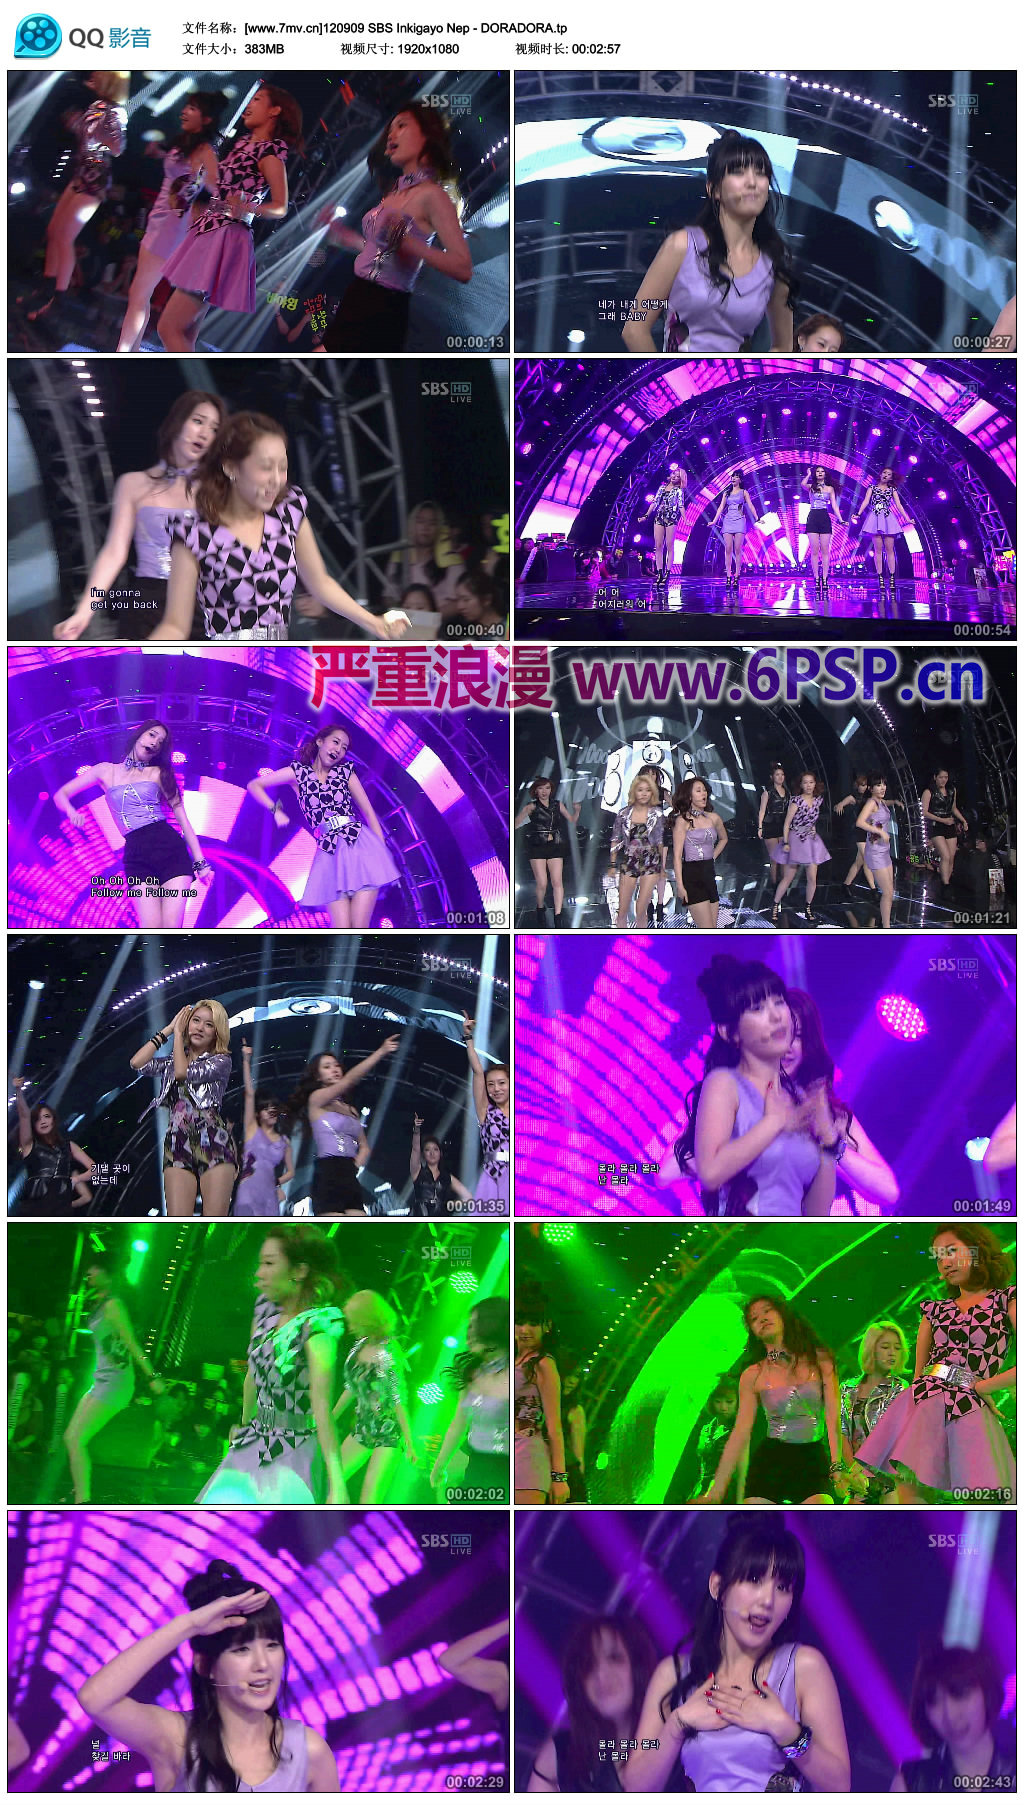 Nep - [DORADORA]_120909.SBS.Inkigayo.人气歌谣.